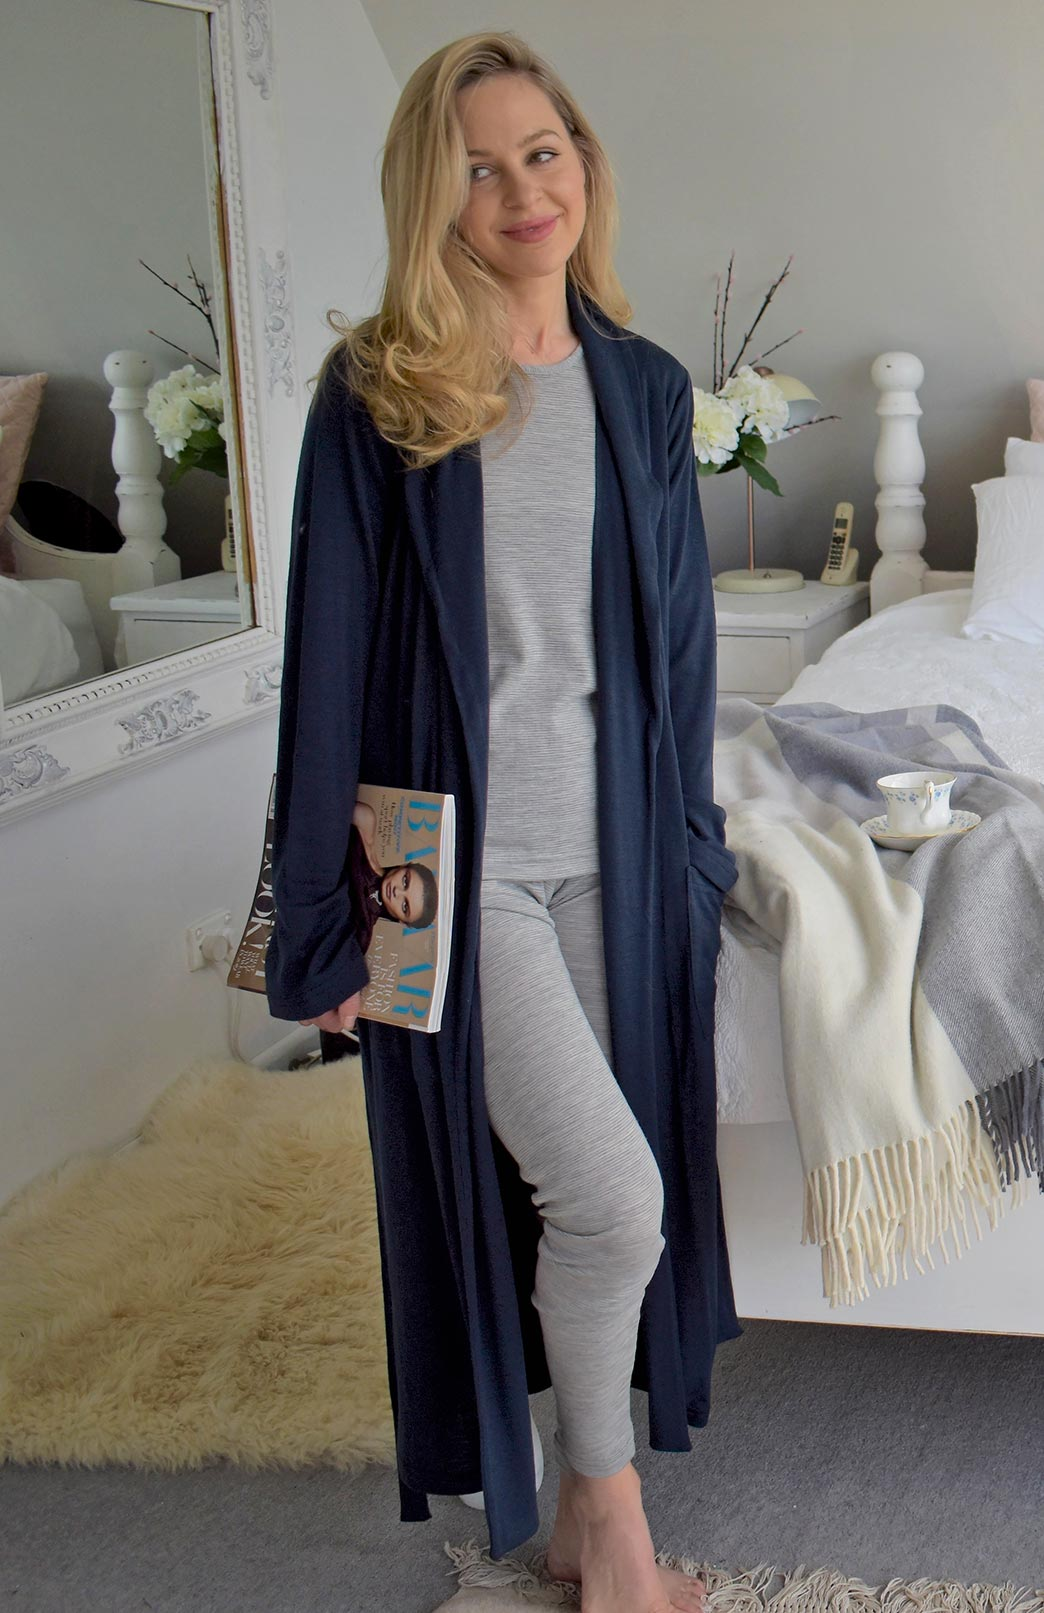 Leggings - Rib - Women's Soft Grey and Ivory Striped Merino Wool Rib Leggings - Smitten Merino Tasmania Australia